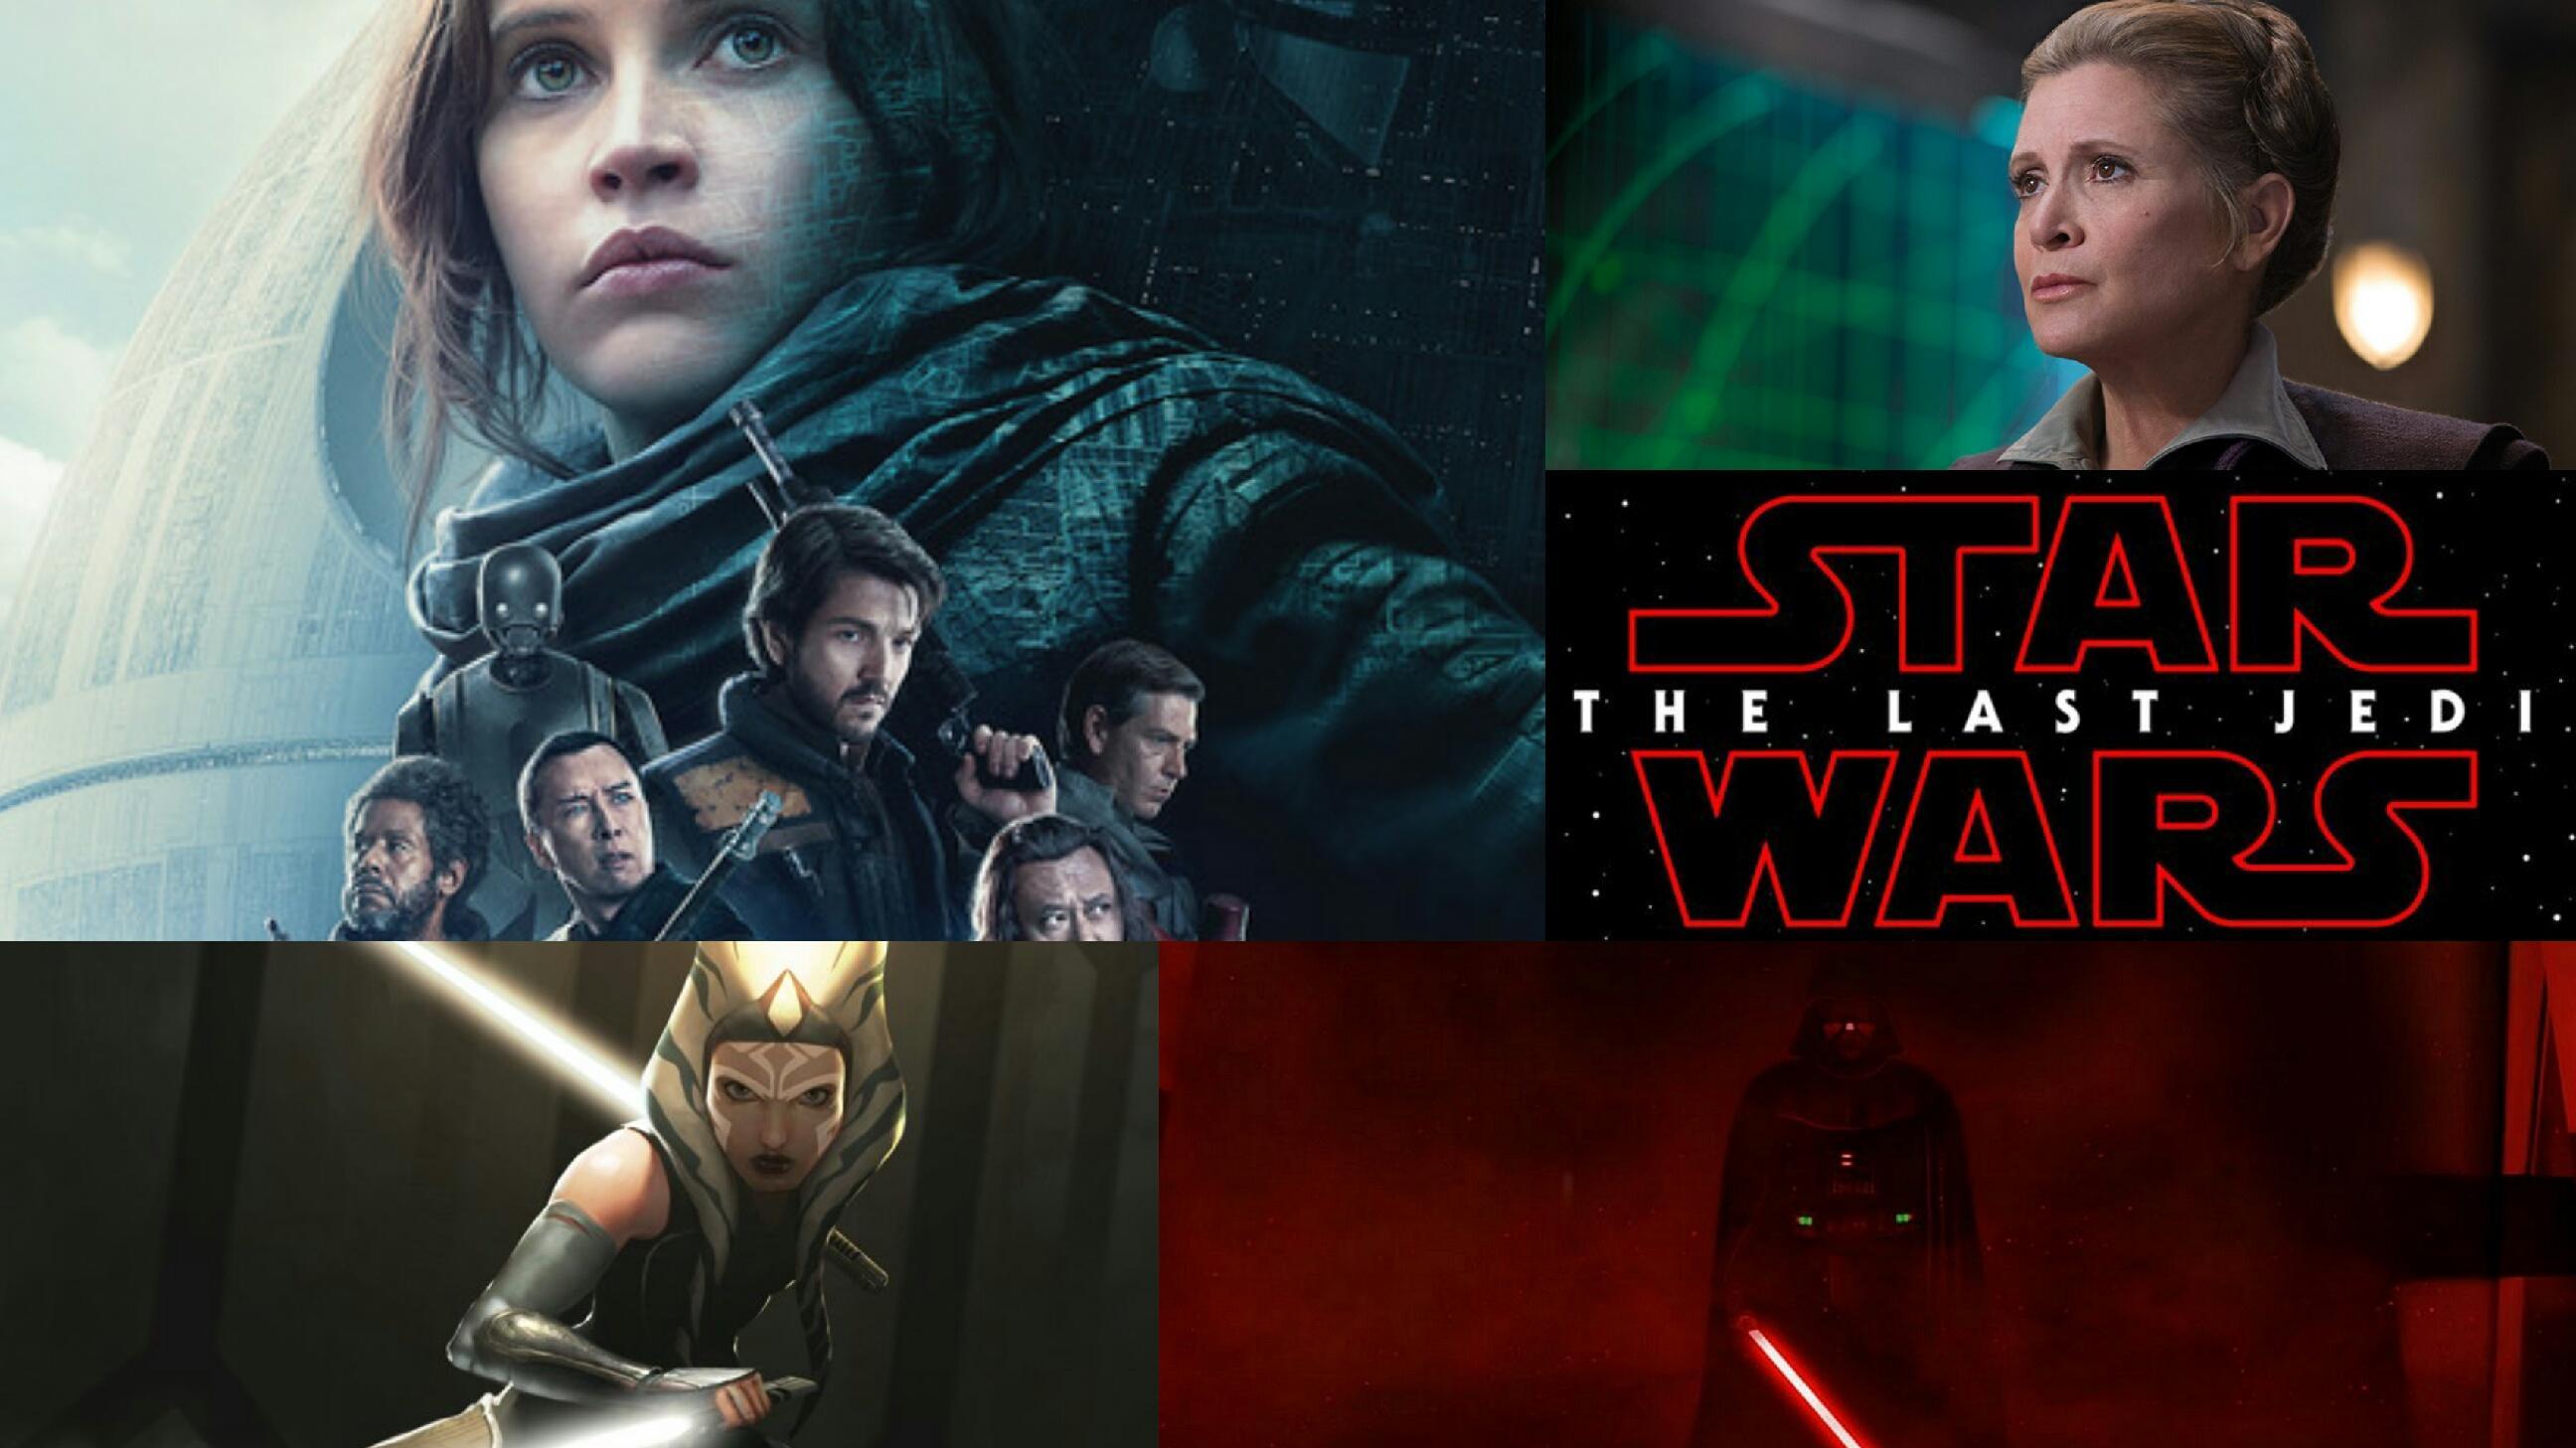 Super Powered Fancast #14: Star Wars